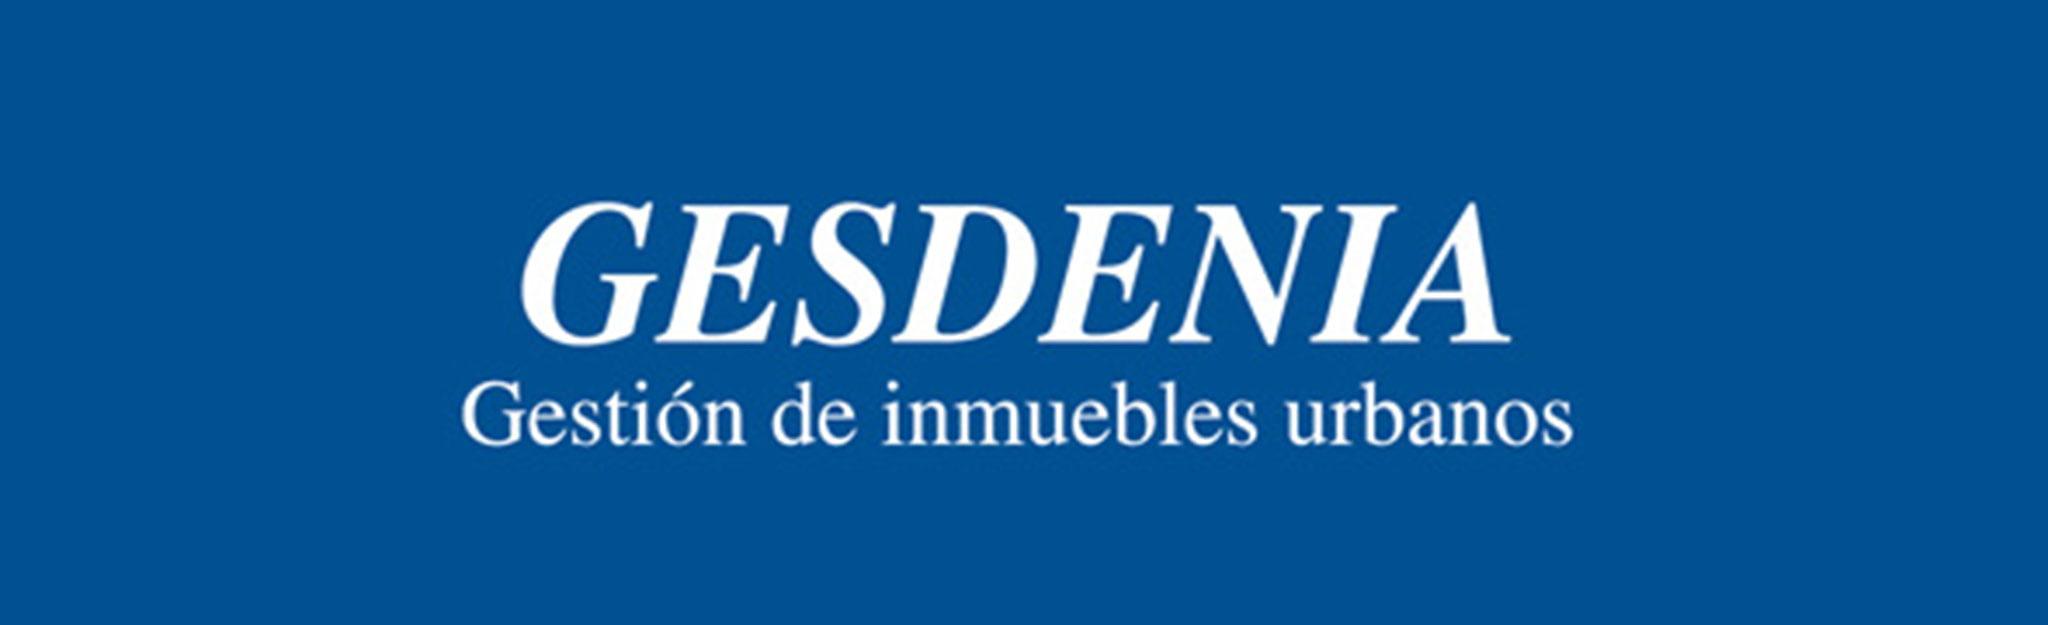 Gesdenia logo